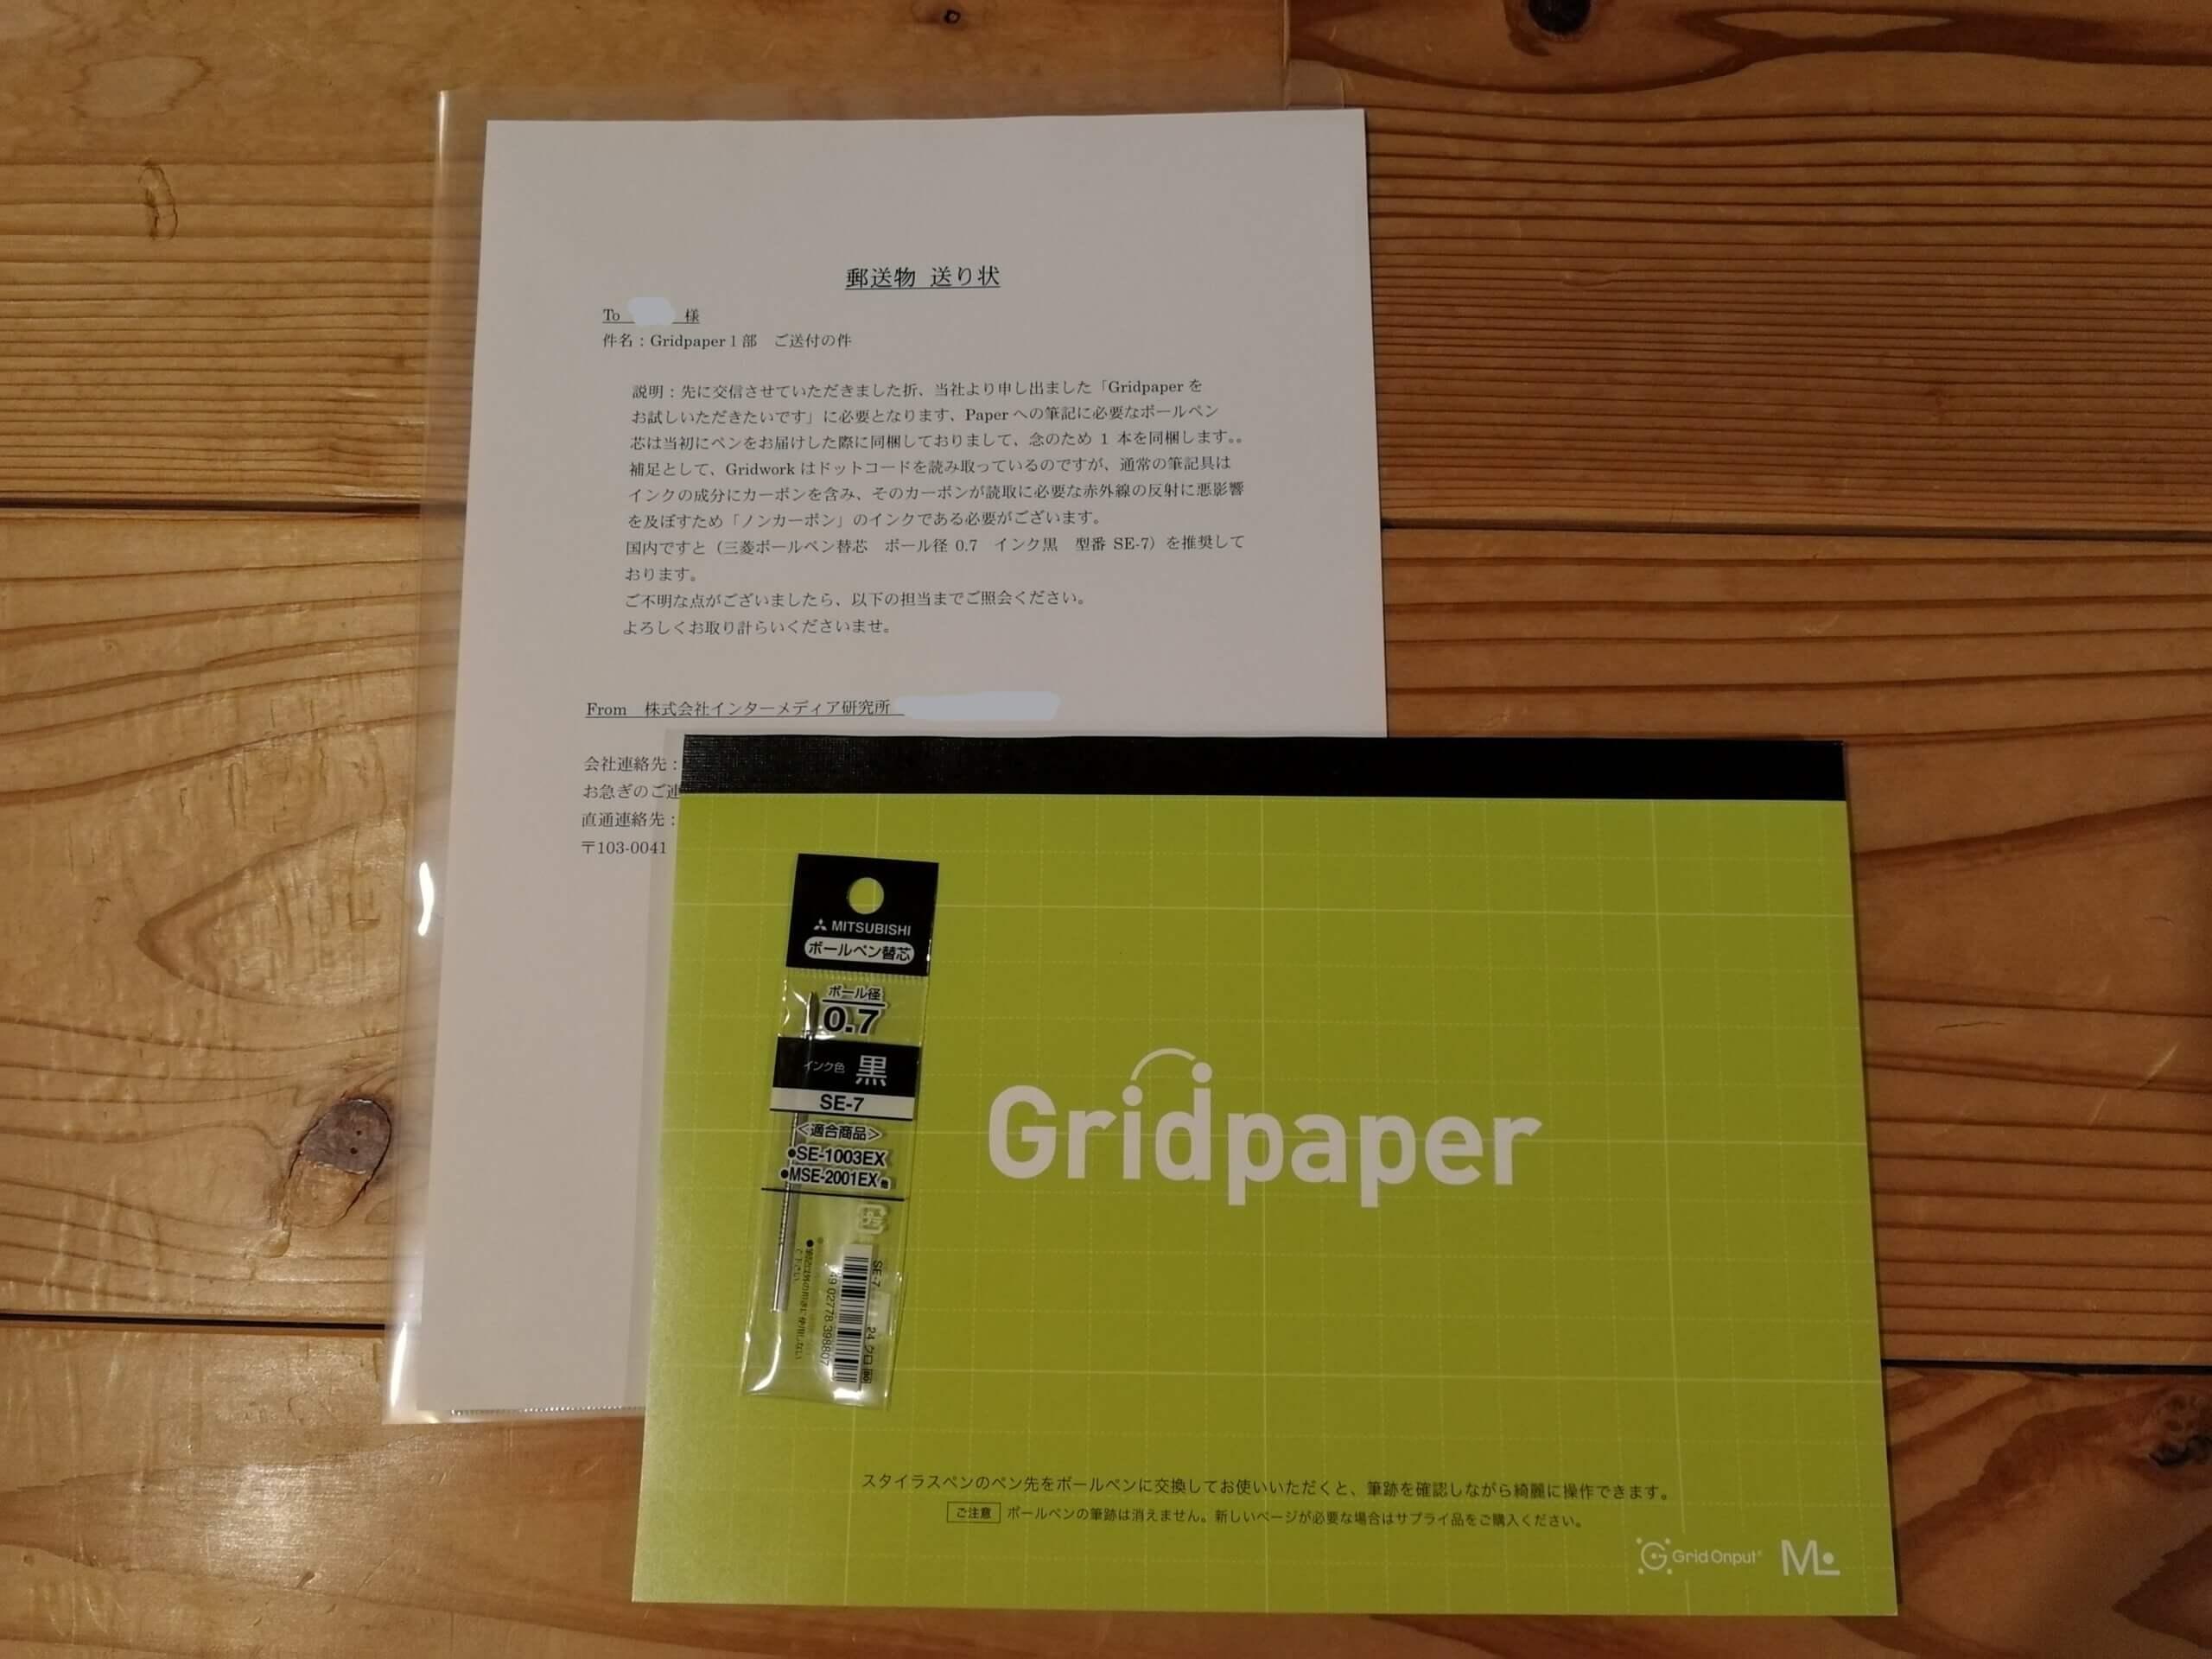 Gridpaperとお手紙